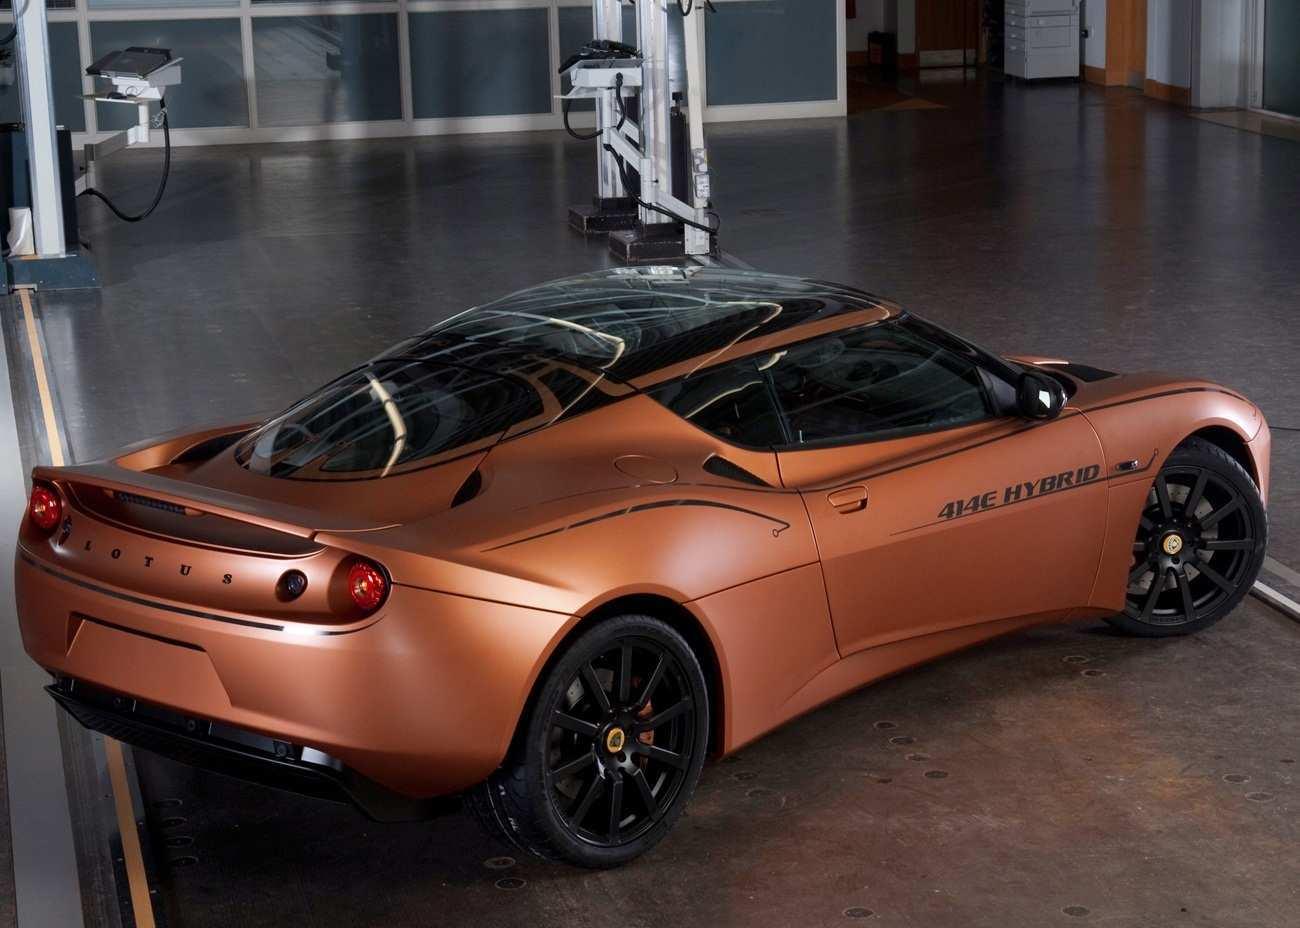 97 Great 2020 Lotus Evora Exterior with 2020 Lotus Evora